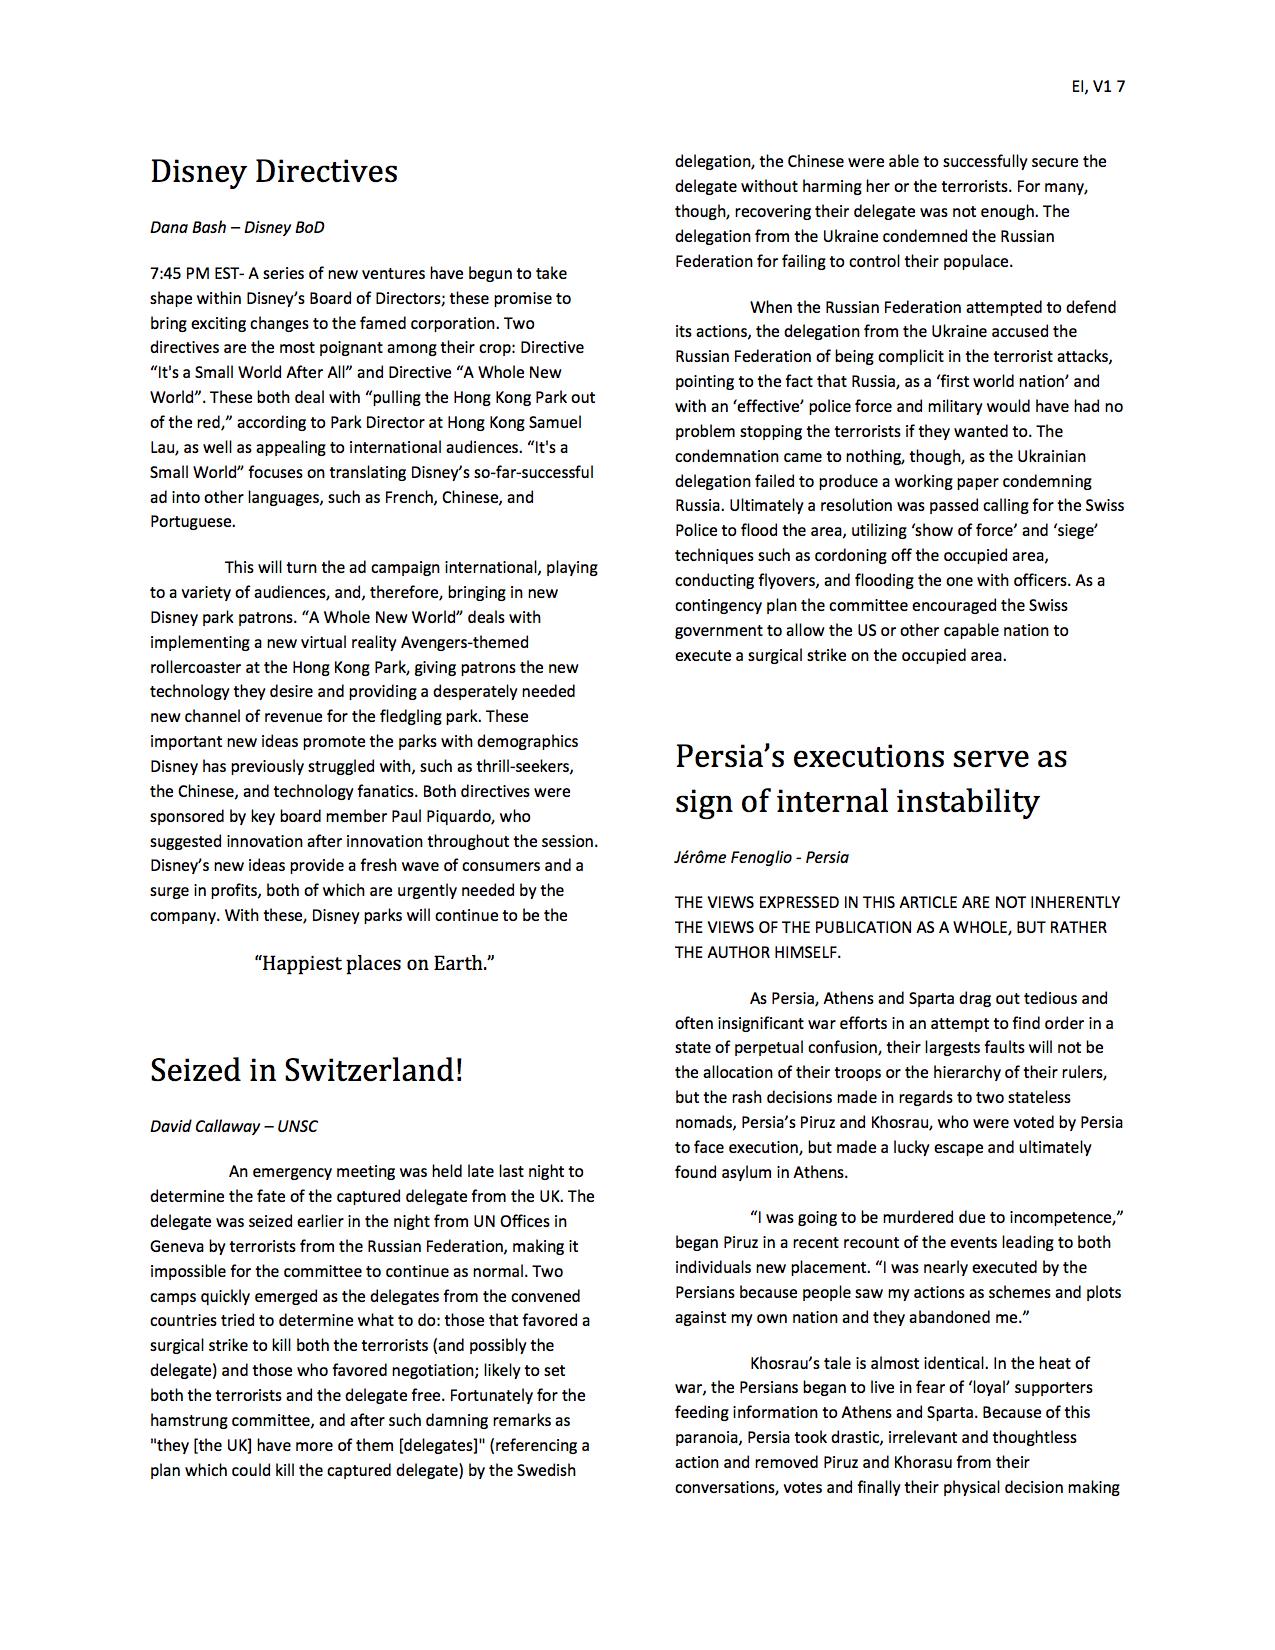 FINALEagle_International_News_(7).jpg